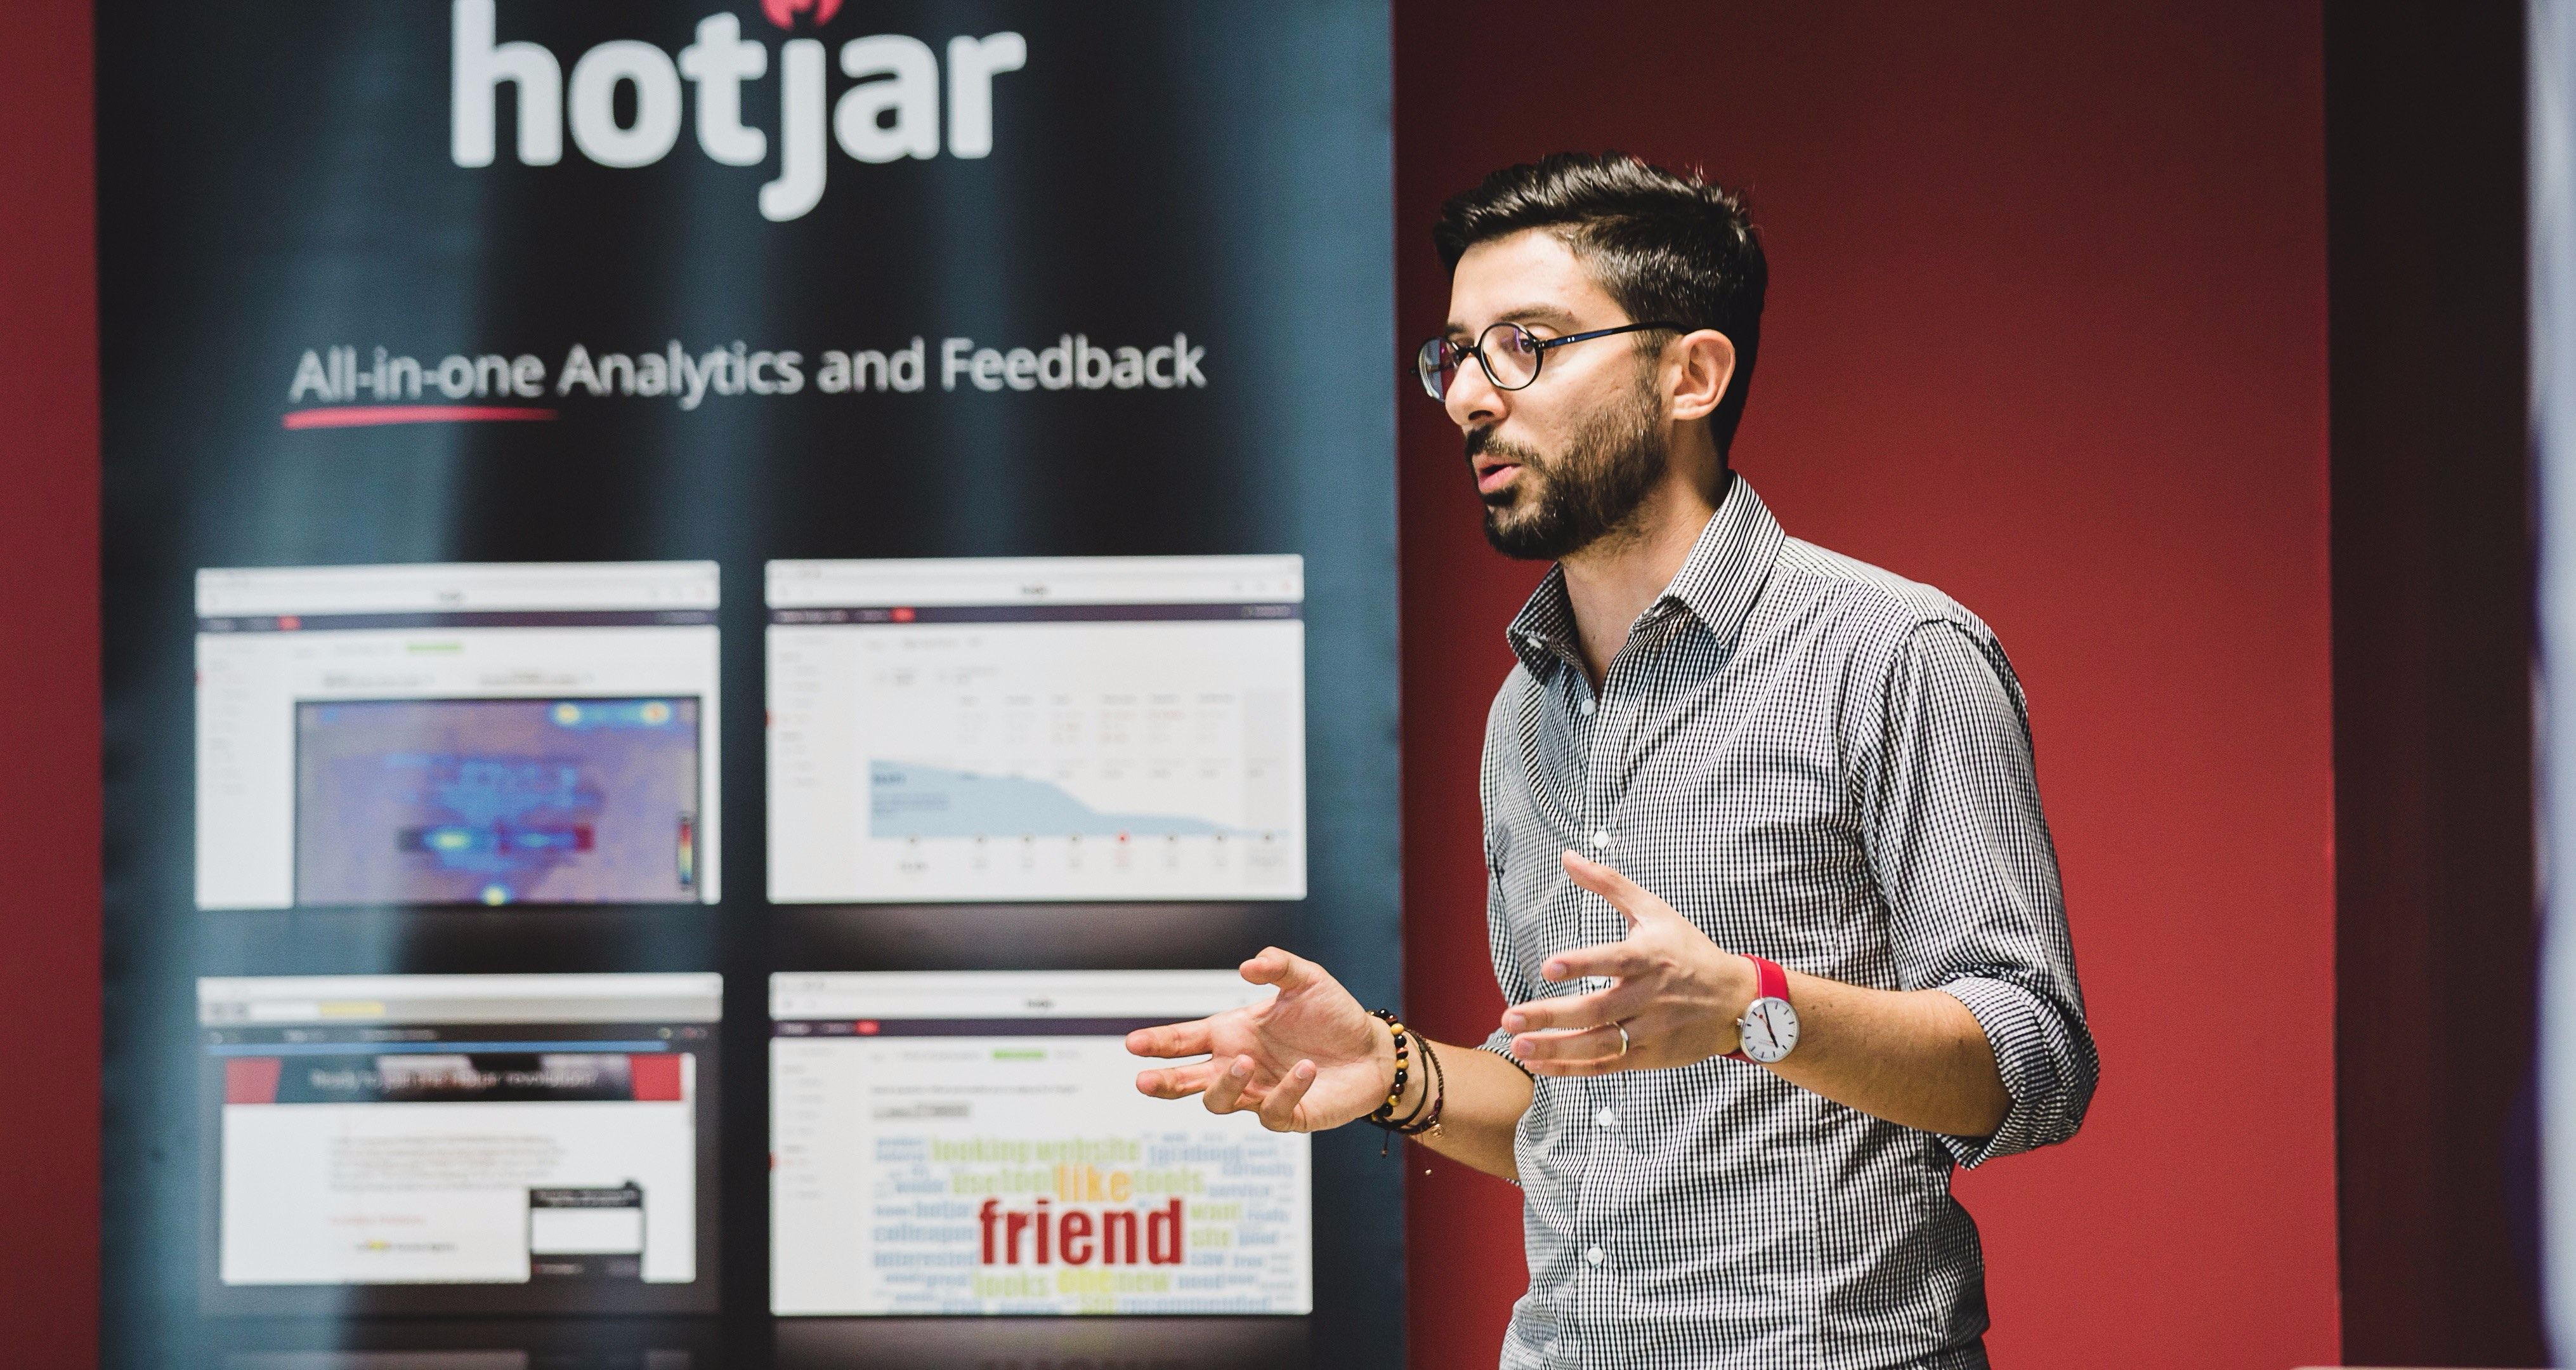 David Darmanin CEO of Hotjar Reveals His Secret to Building a Successful Remote Team